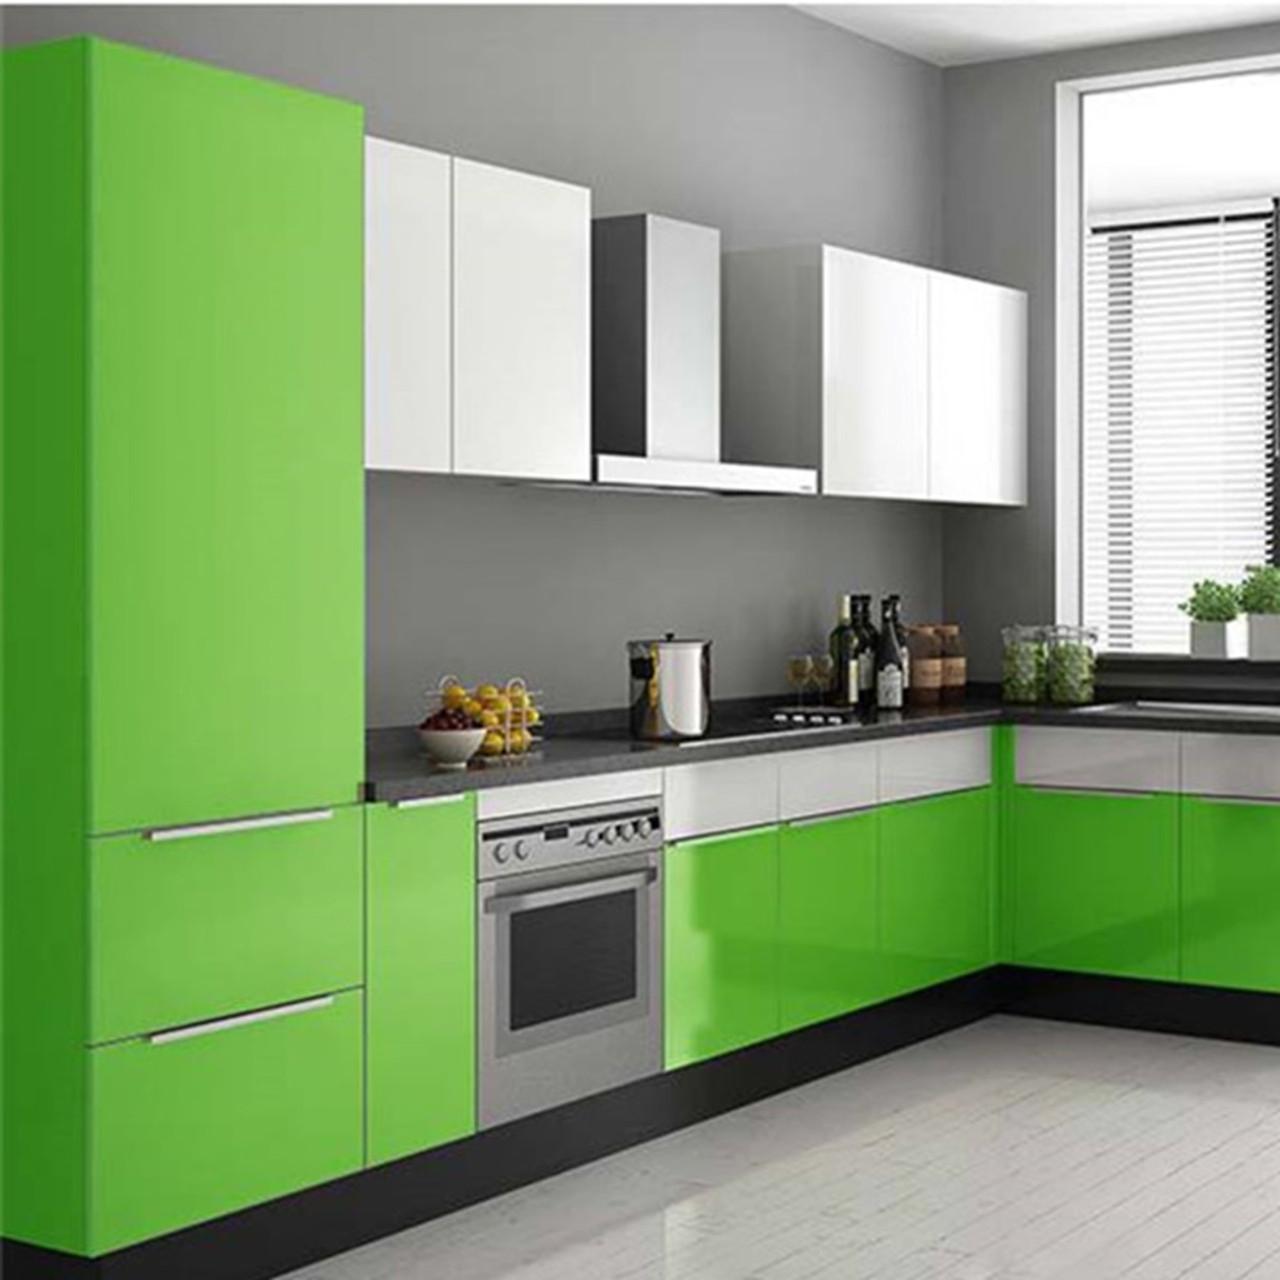 Waterproof Pvc Vinyl Solid Color Green Self Adhesive Wallpaper